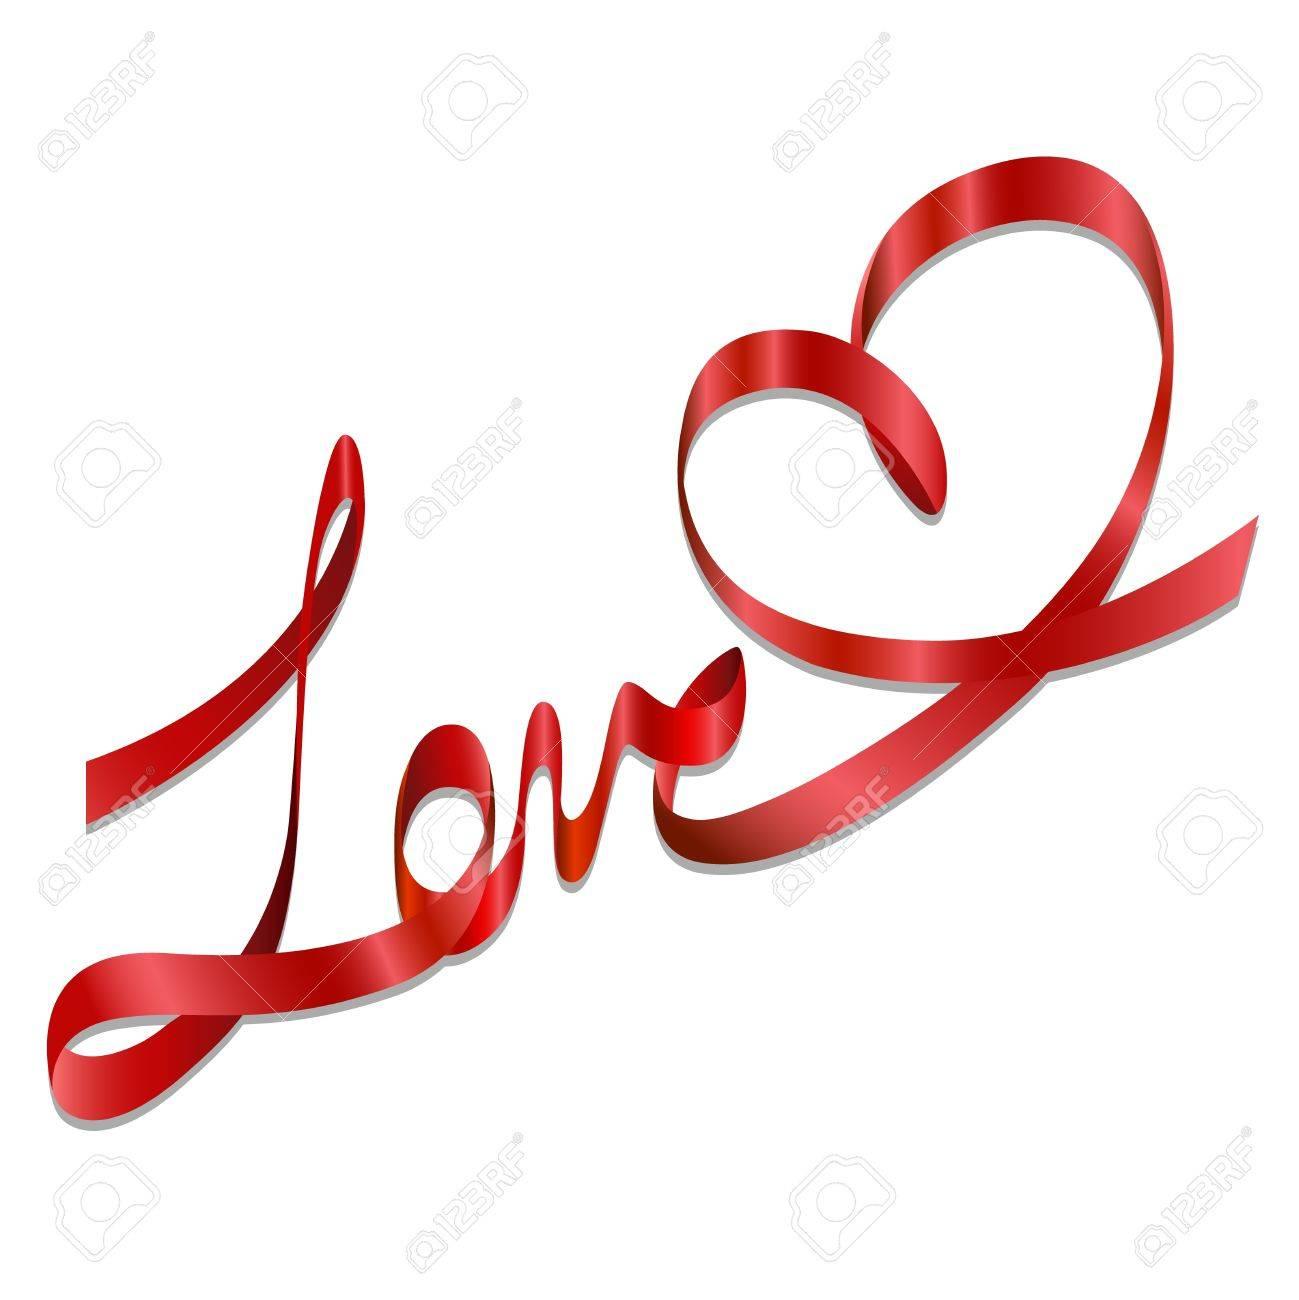 Elegant Romantic Love Gift Bows Ribbon Vector Royalty Free Cliparts